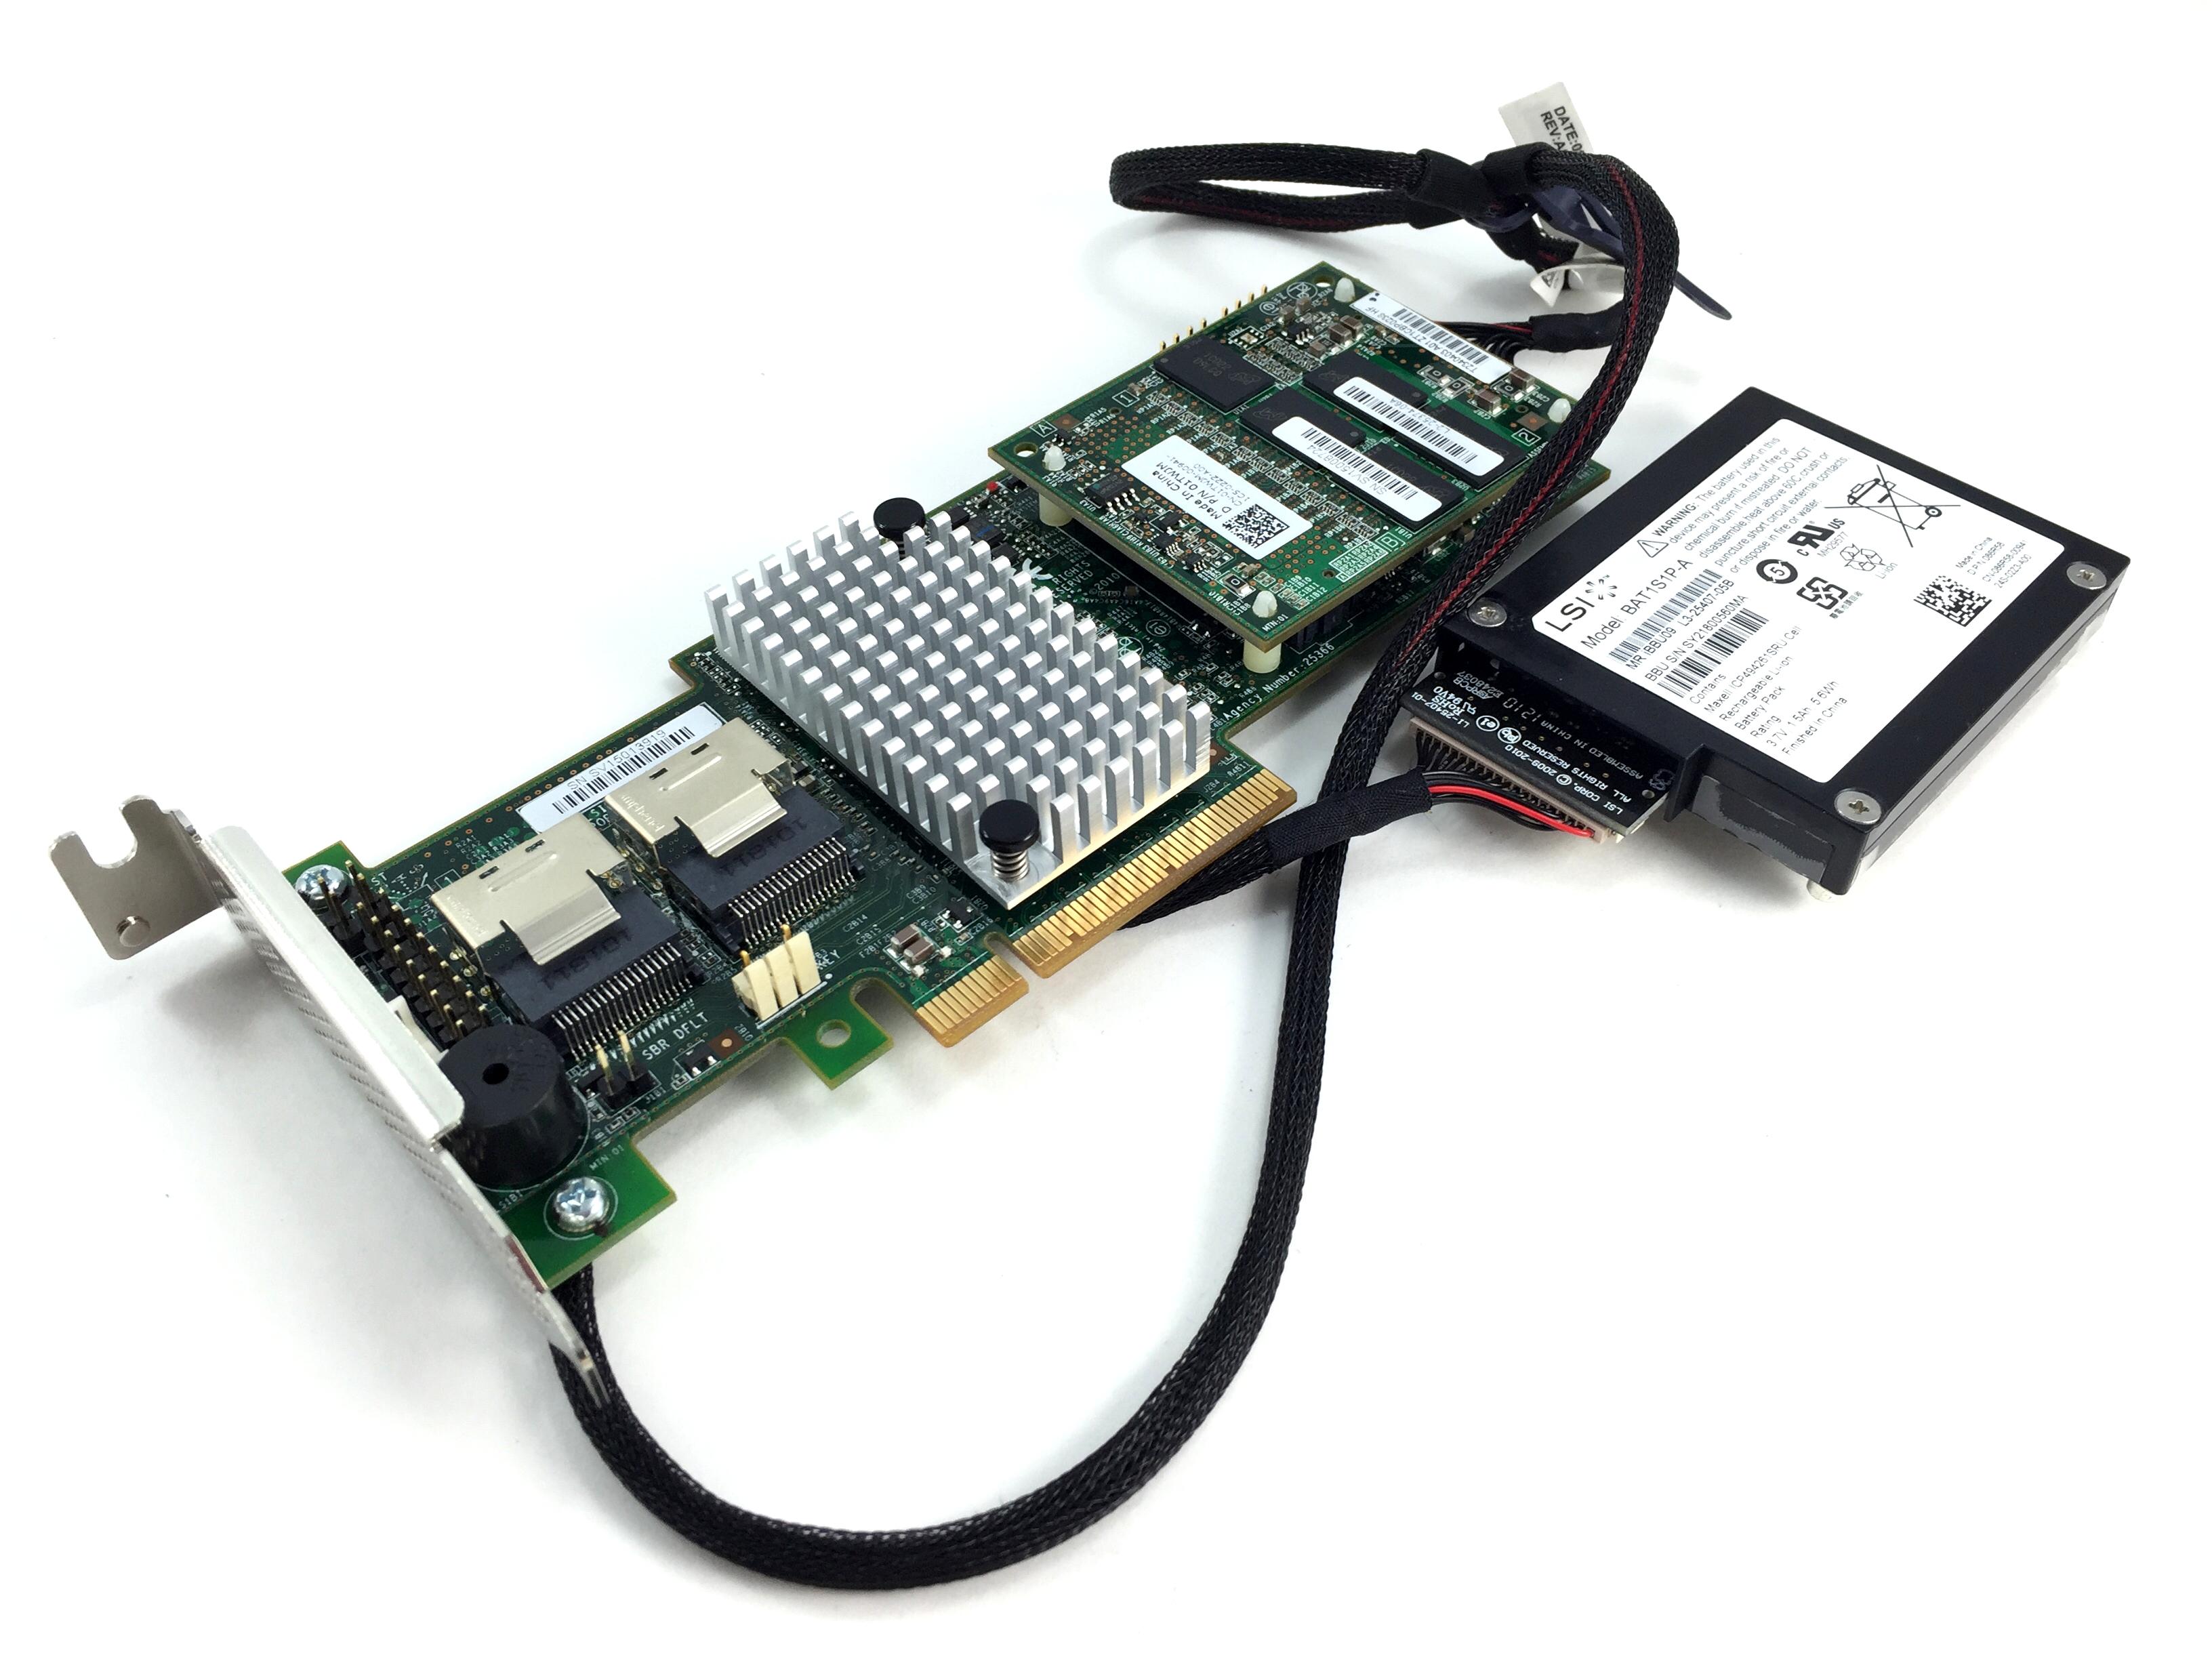 DELL LSI 9265-8I 6GBPS SAS/SATA RAID CONTROLLER. (070MJ8)